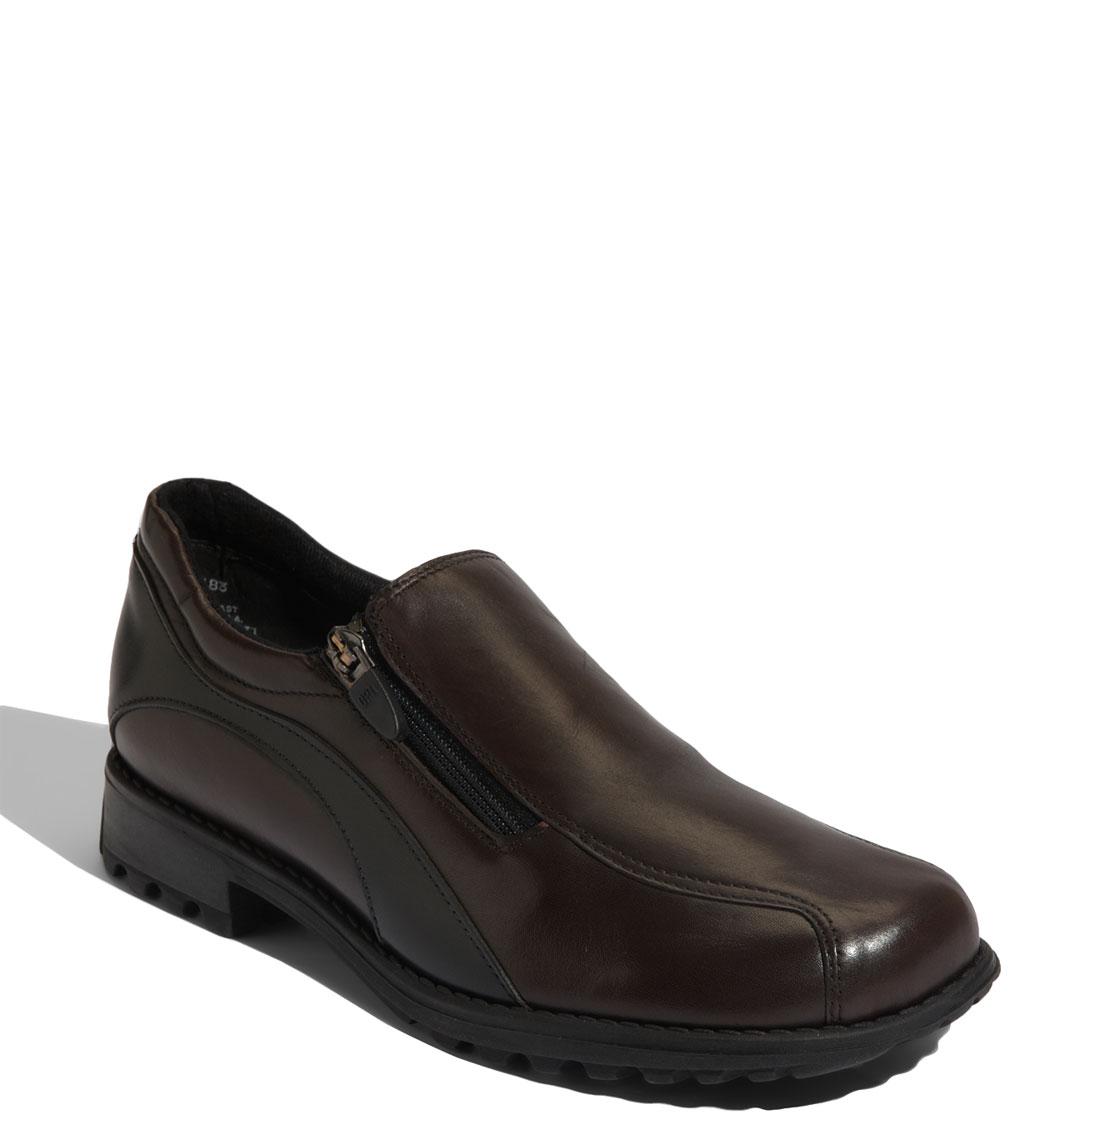 Munro Evie Shoes Sale